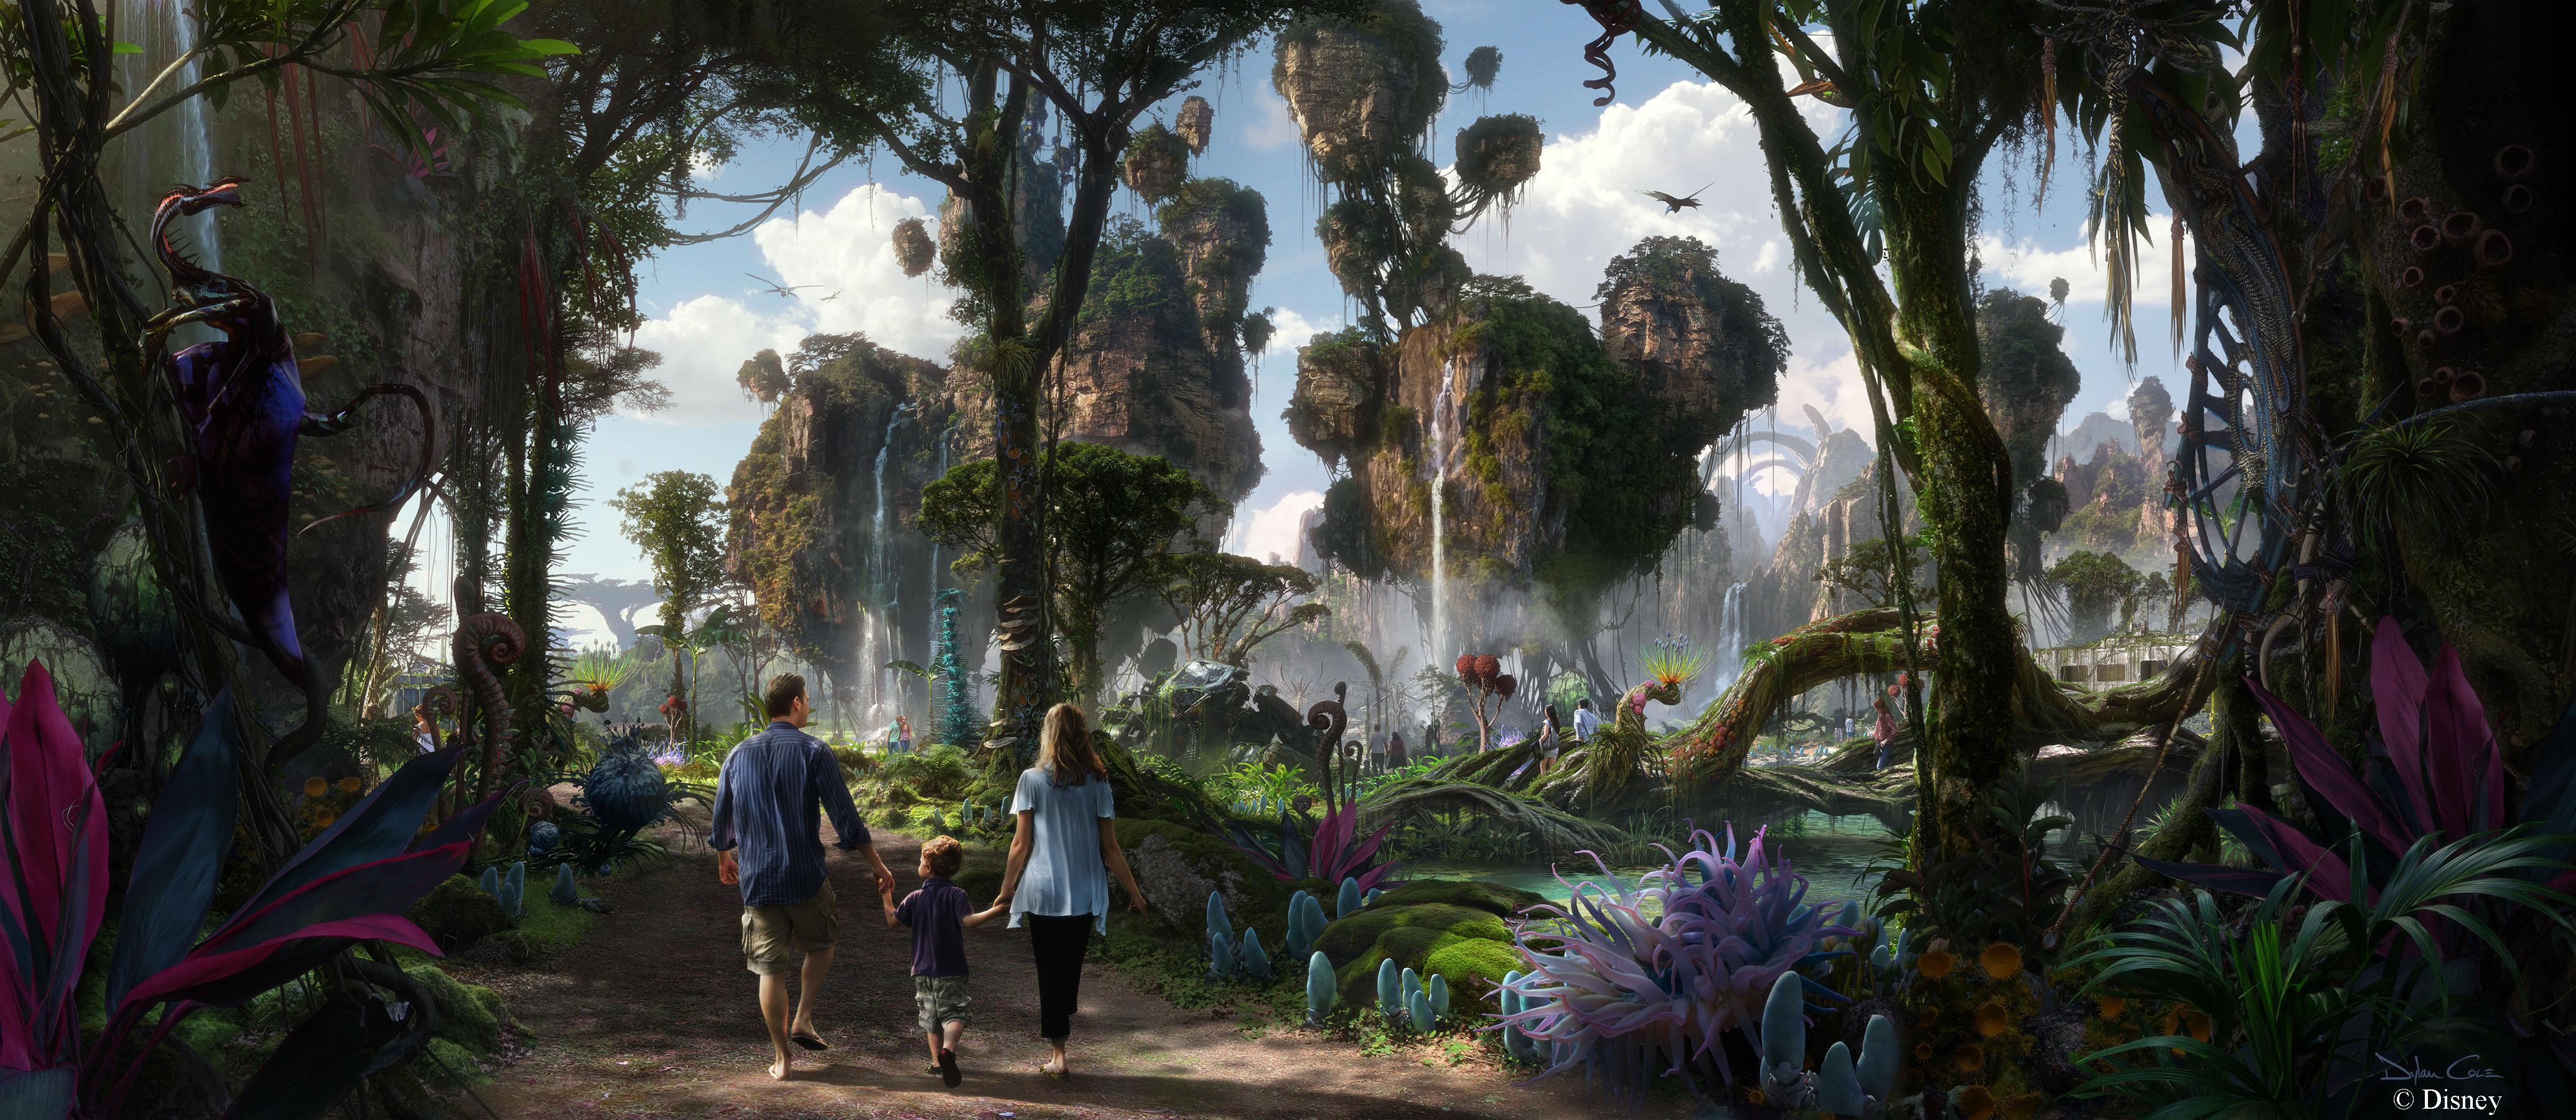 Pandora: The World of Avatar | Disney Wiki | Fandom